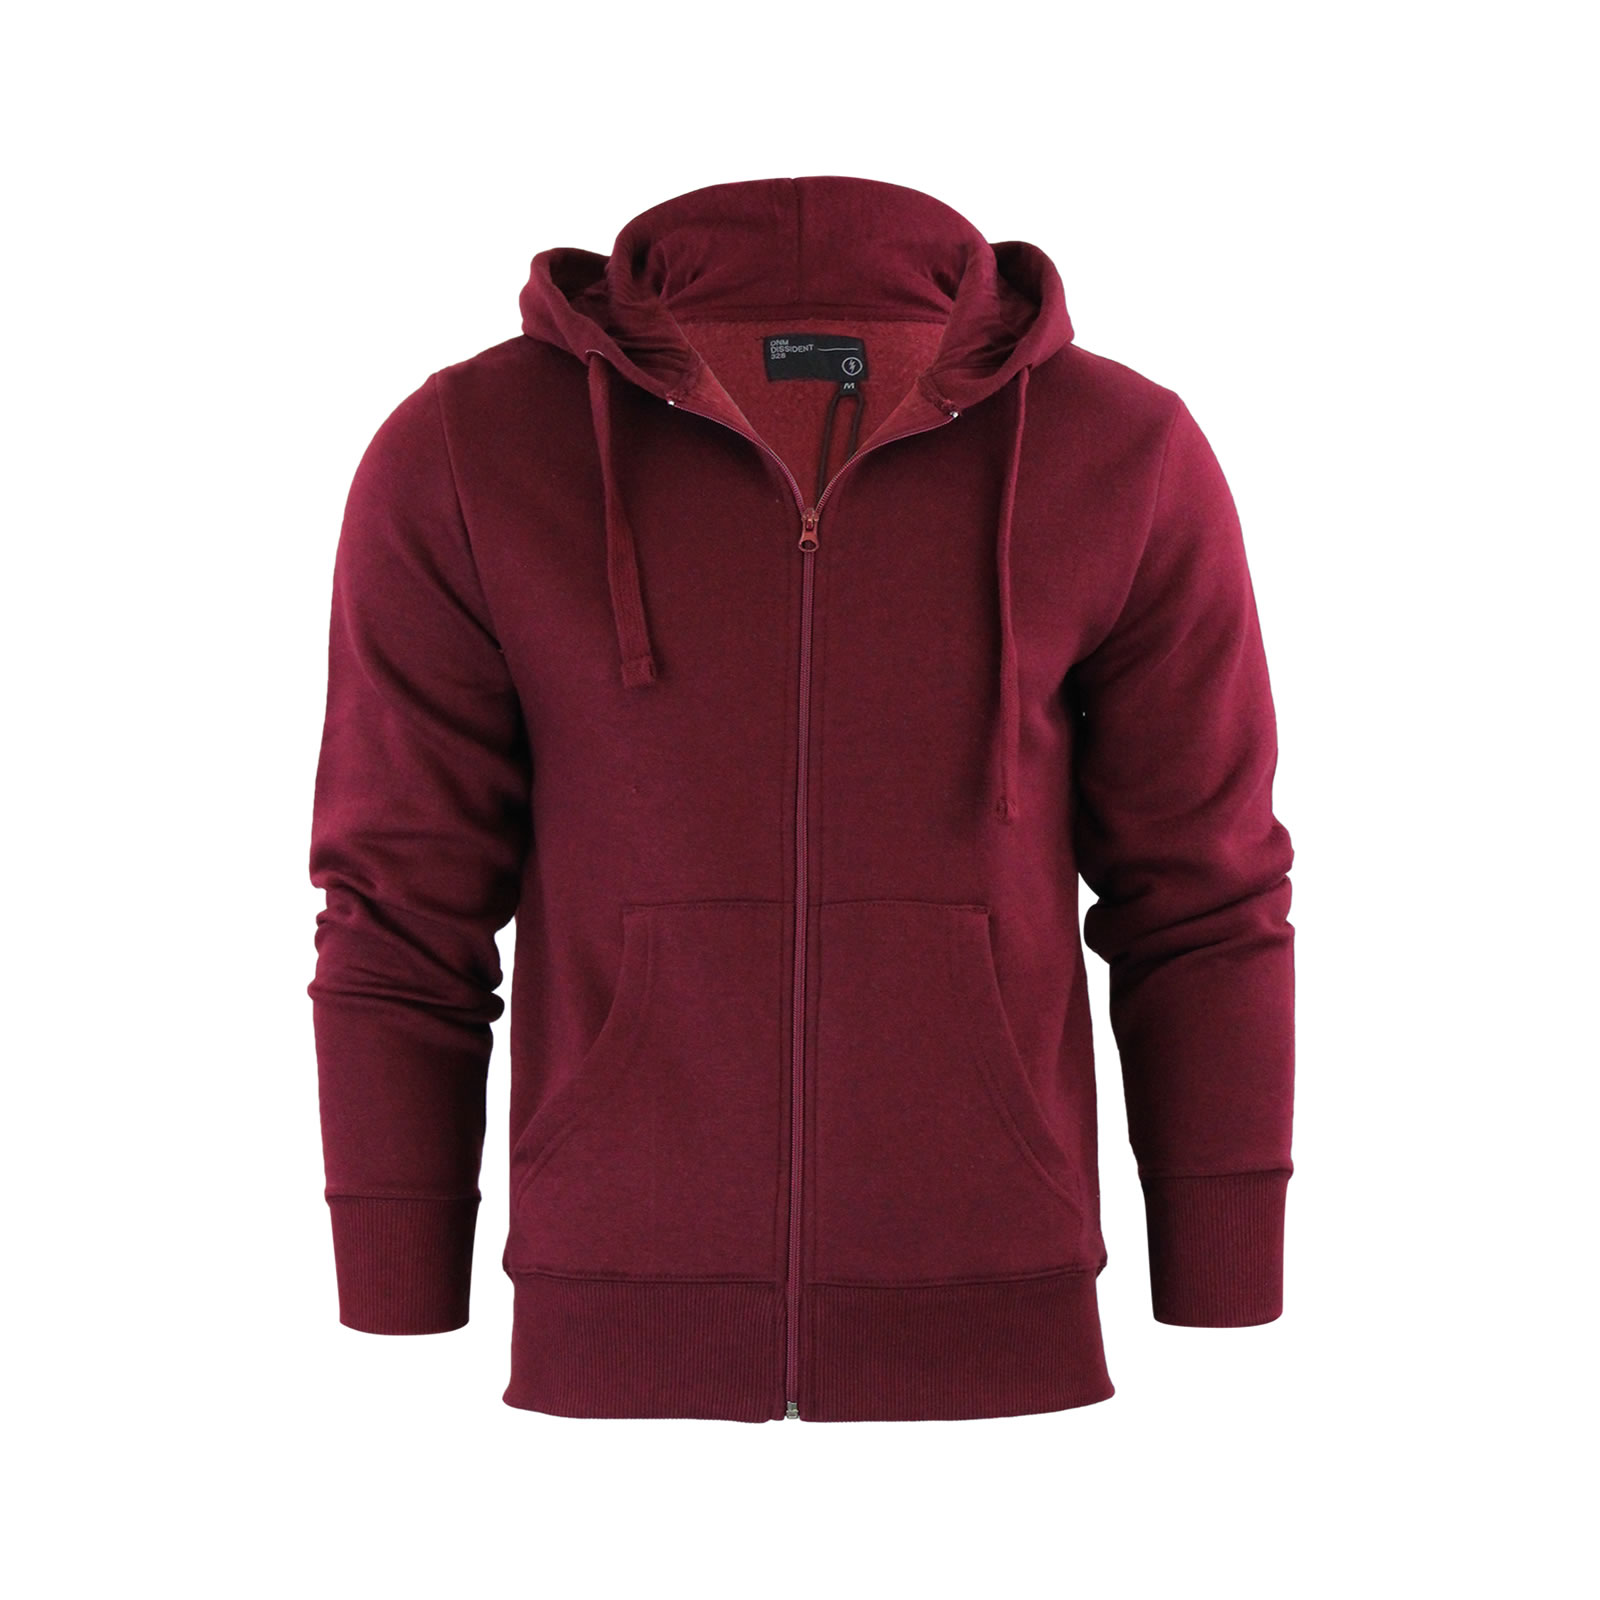 Mens hoodies zip up